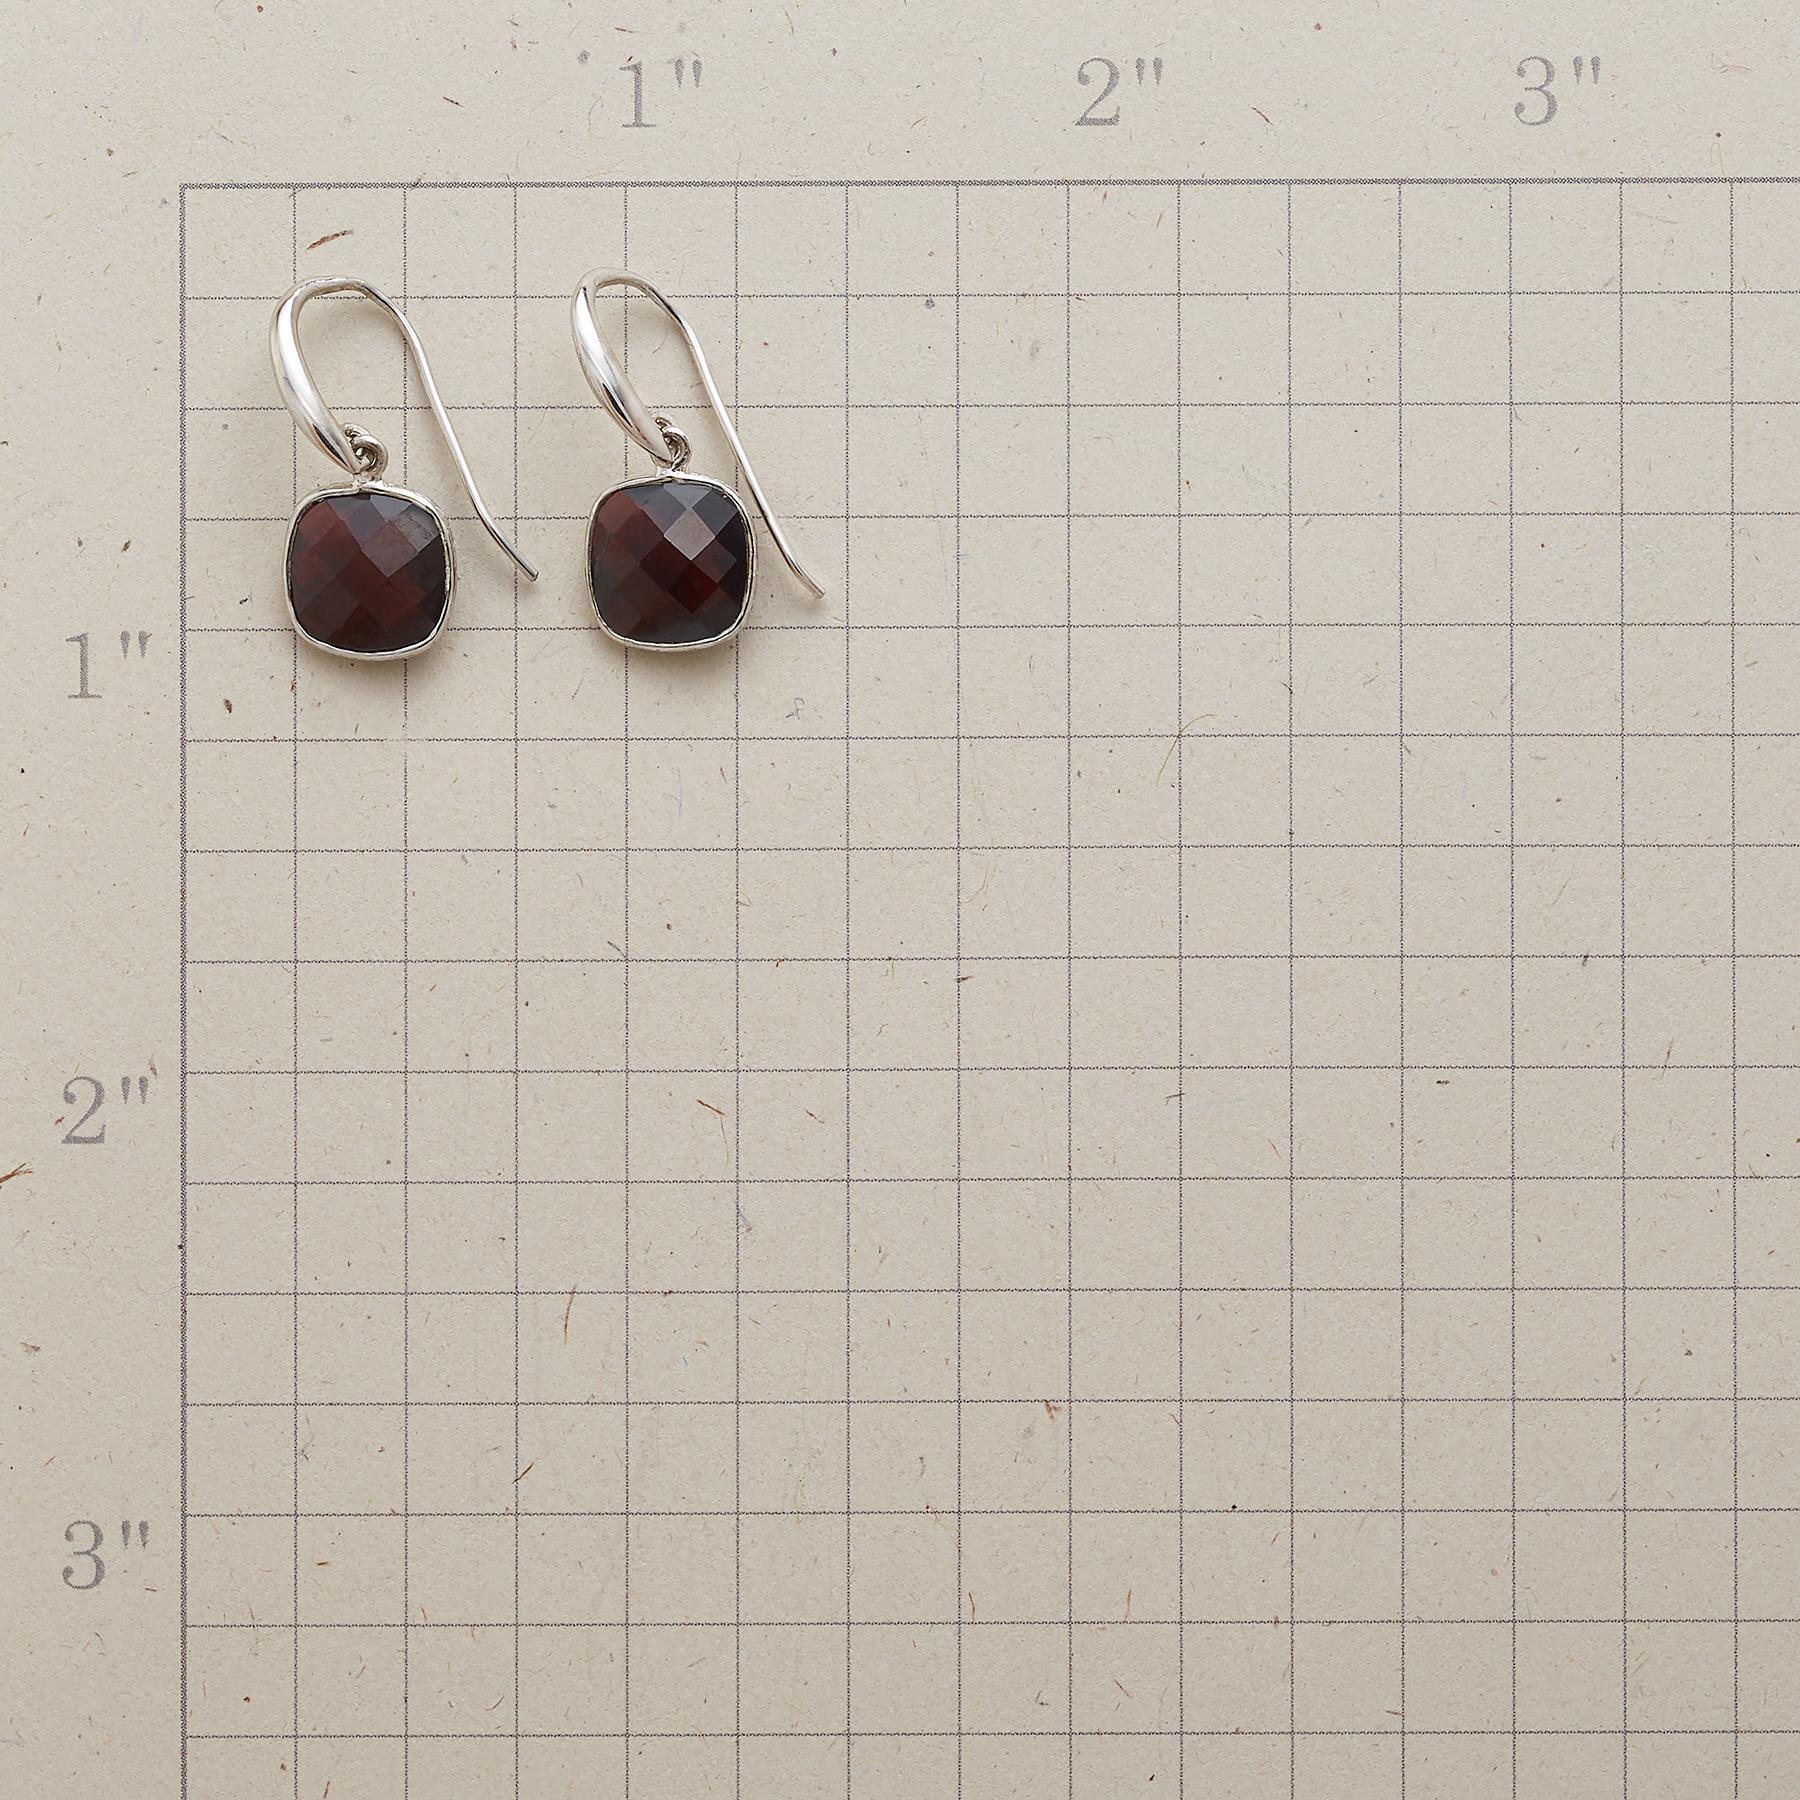 CHECKED GARNET EARRINGS: View 2